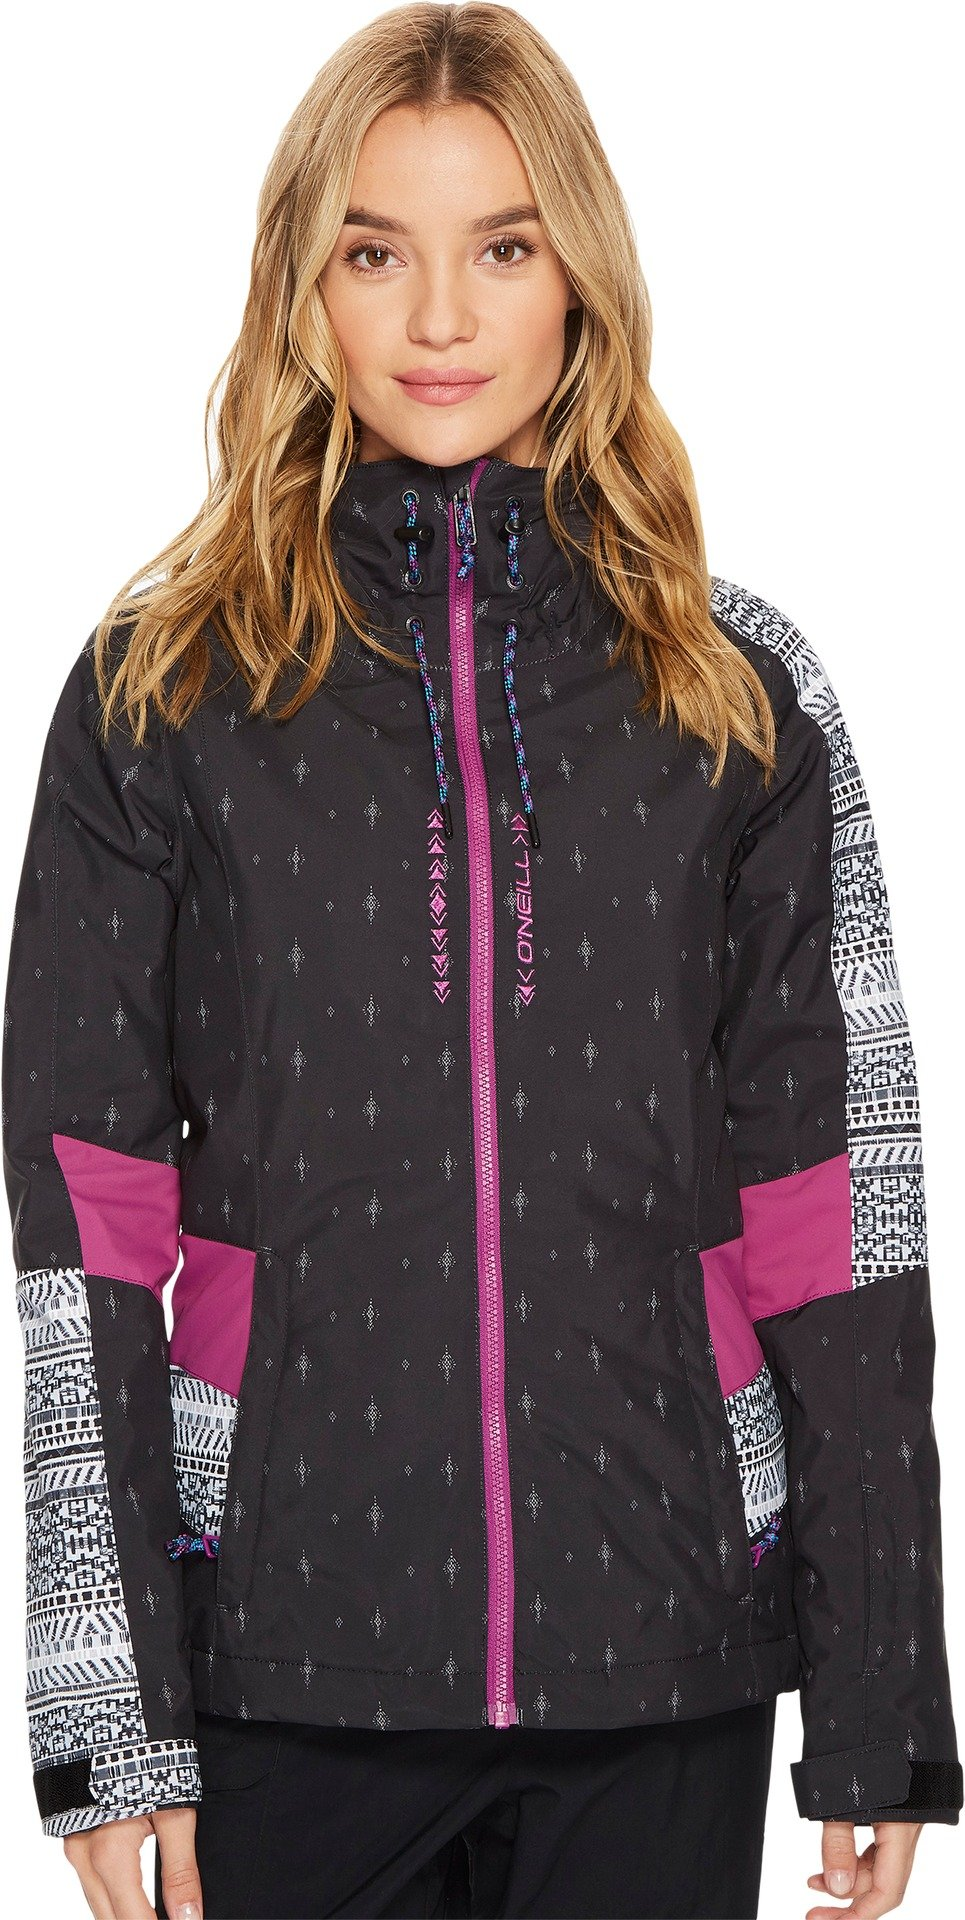 O'Neill Women's Reunion Jacket, Hollyhock, Large